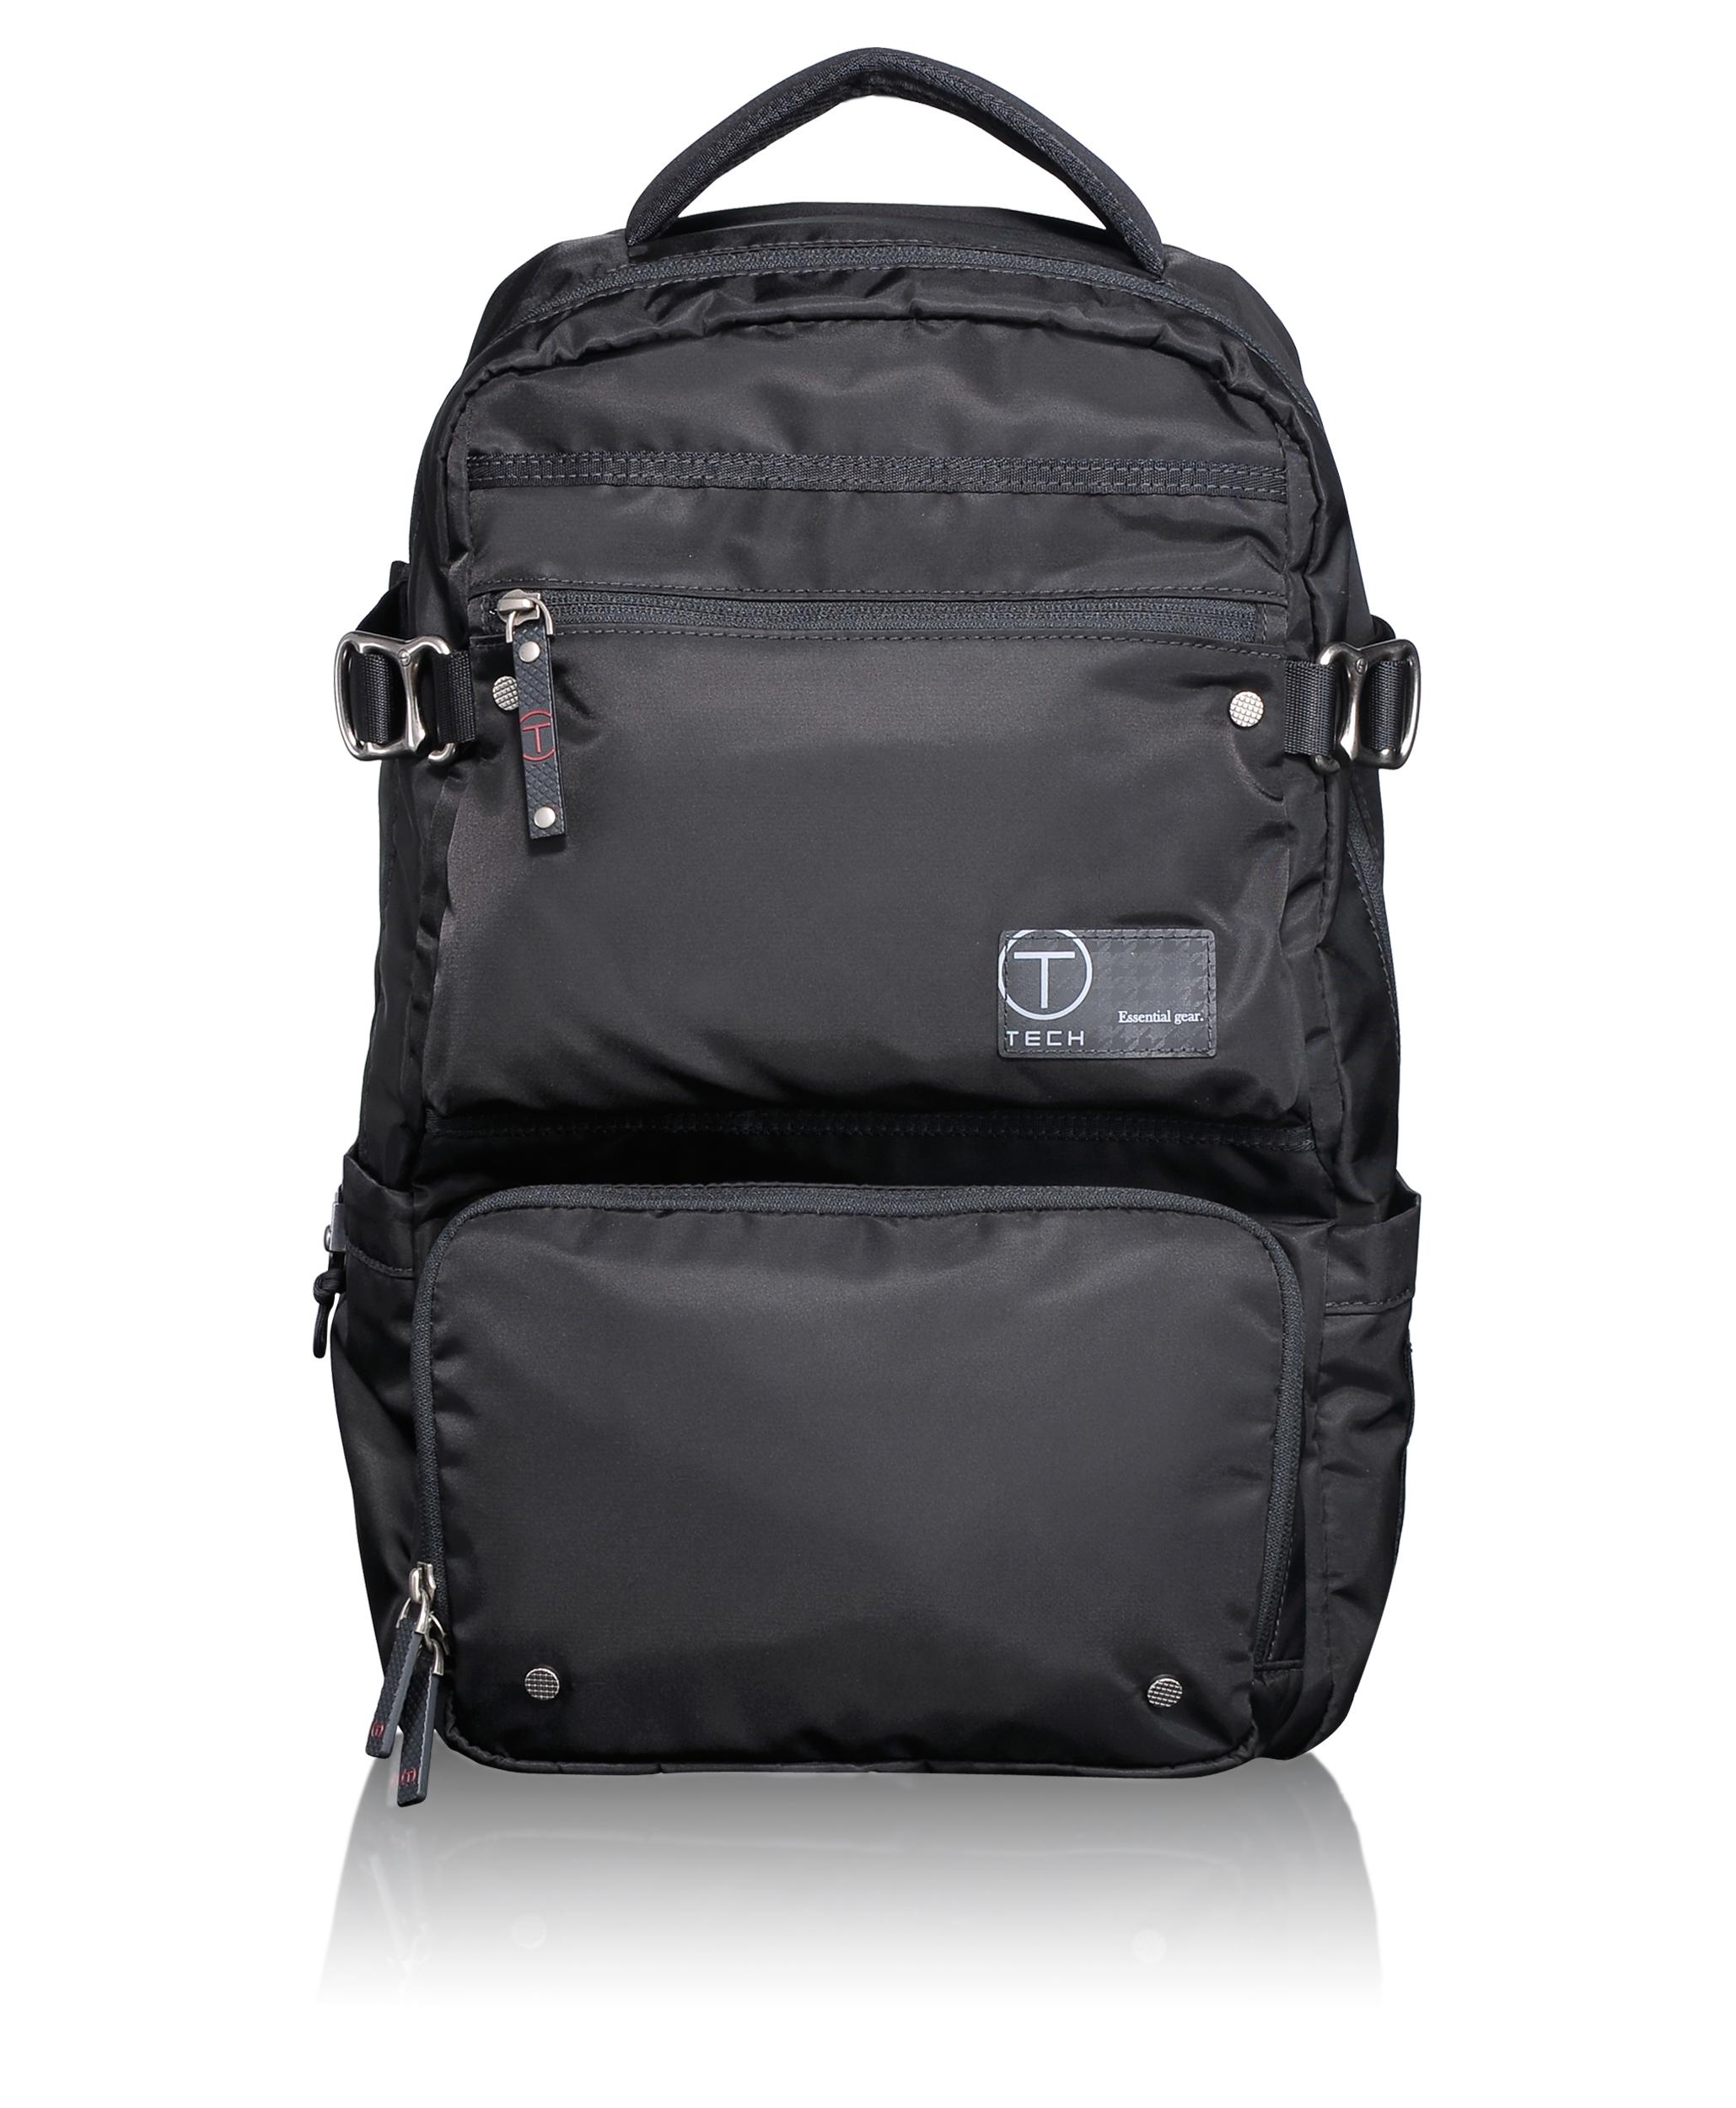 57580 Black T-Tech Icon Melville Zip Top Brief Pack .jpg